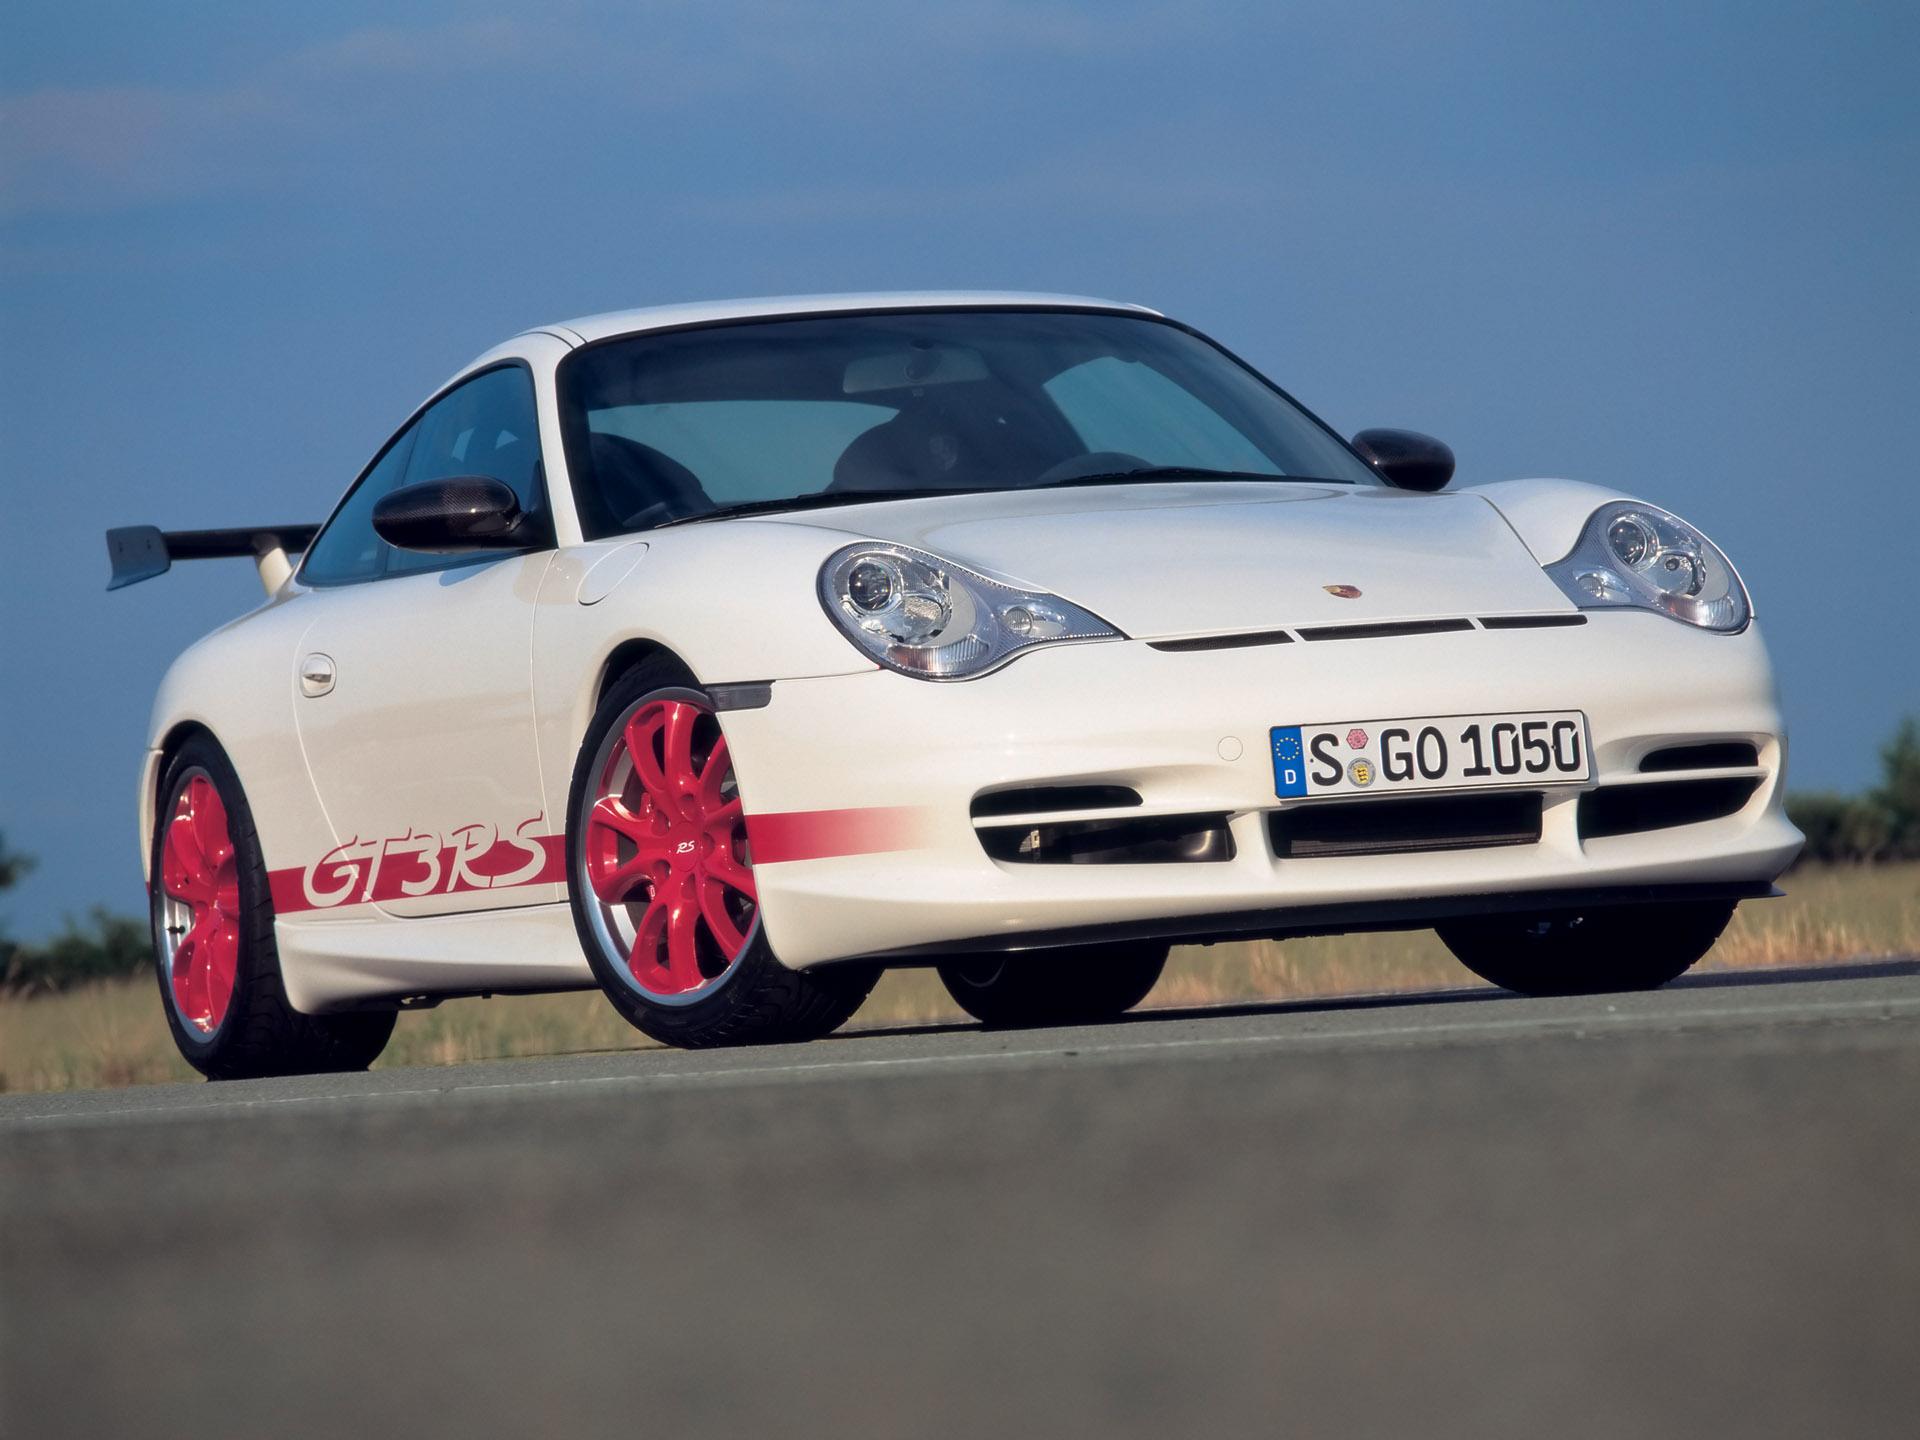 2004 Porsche Show or Display